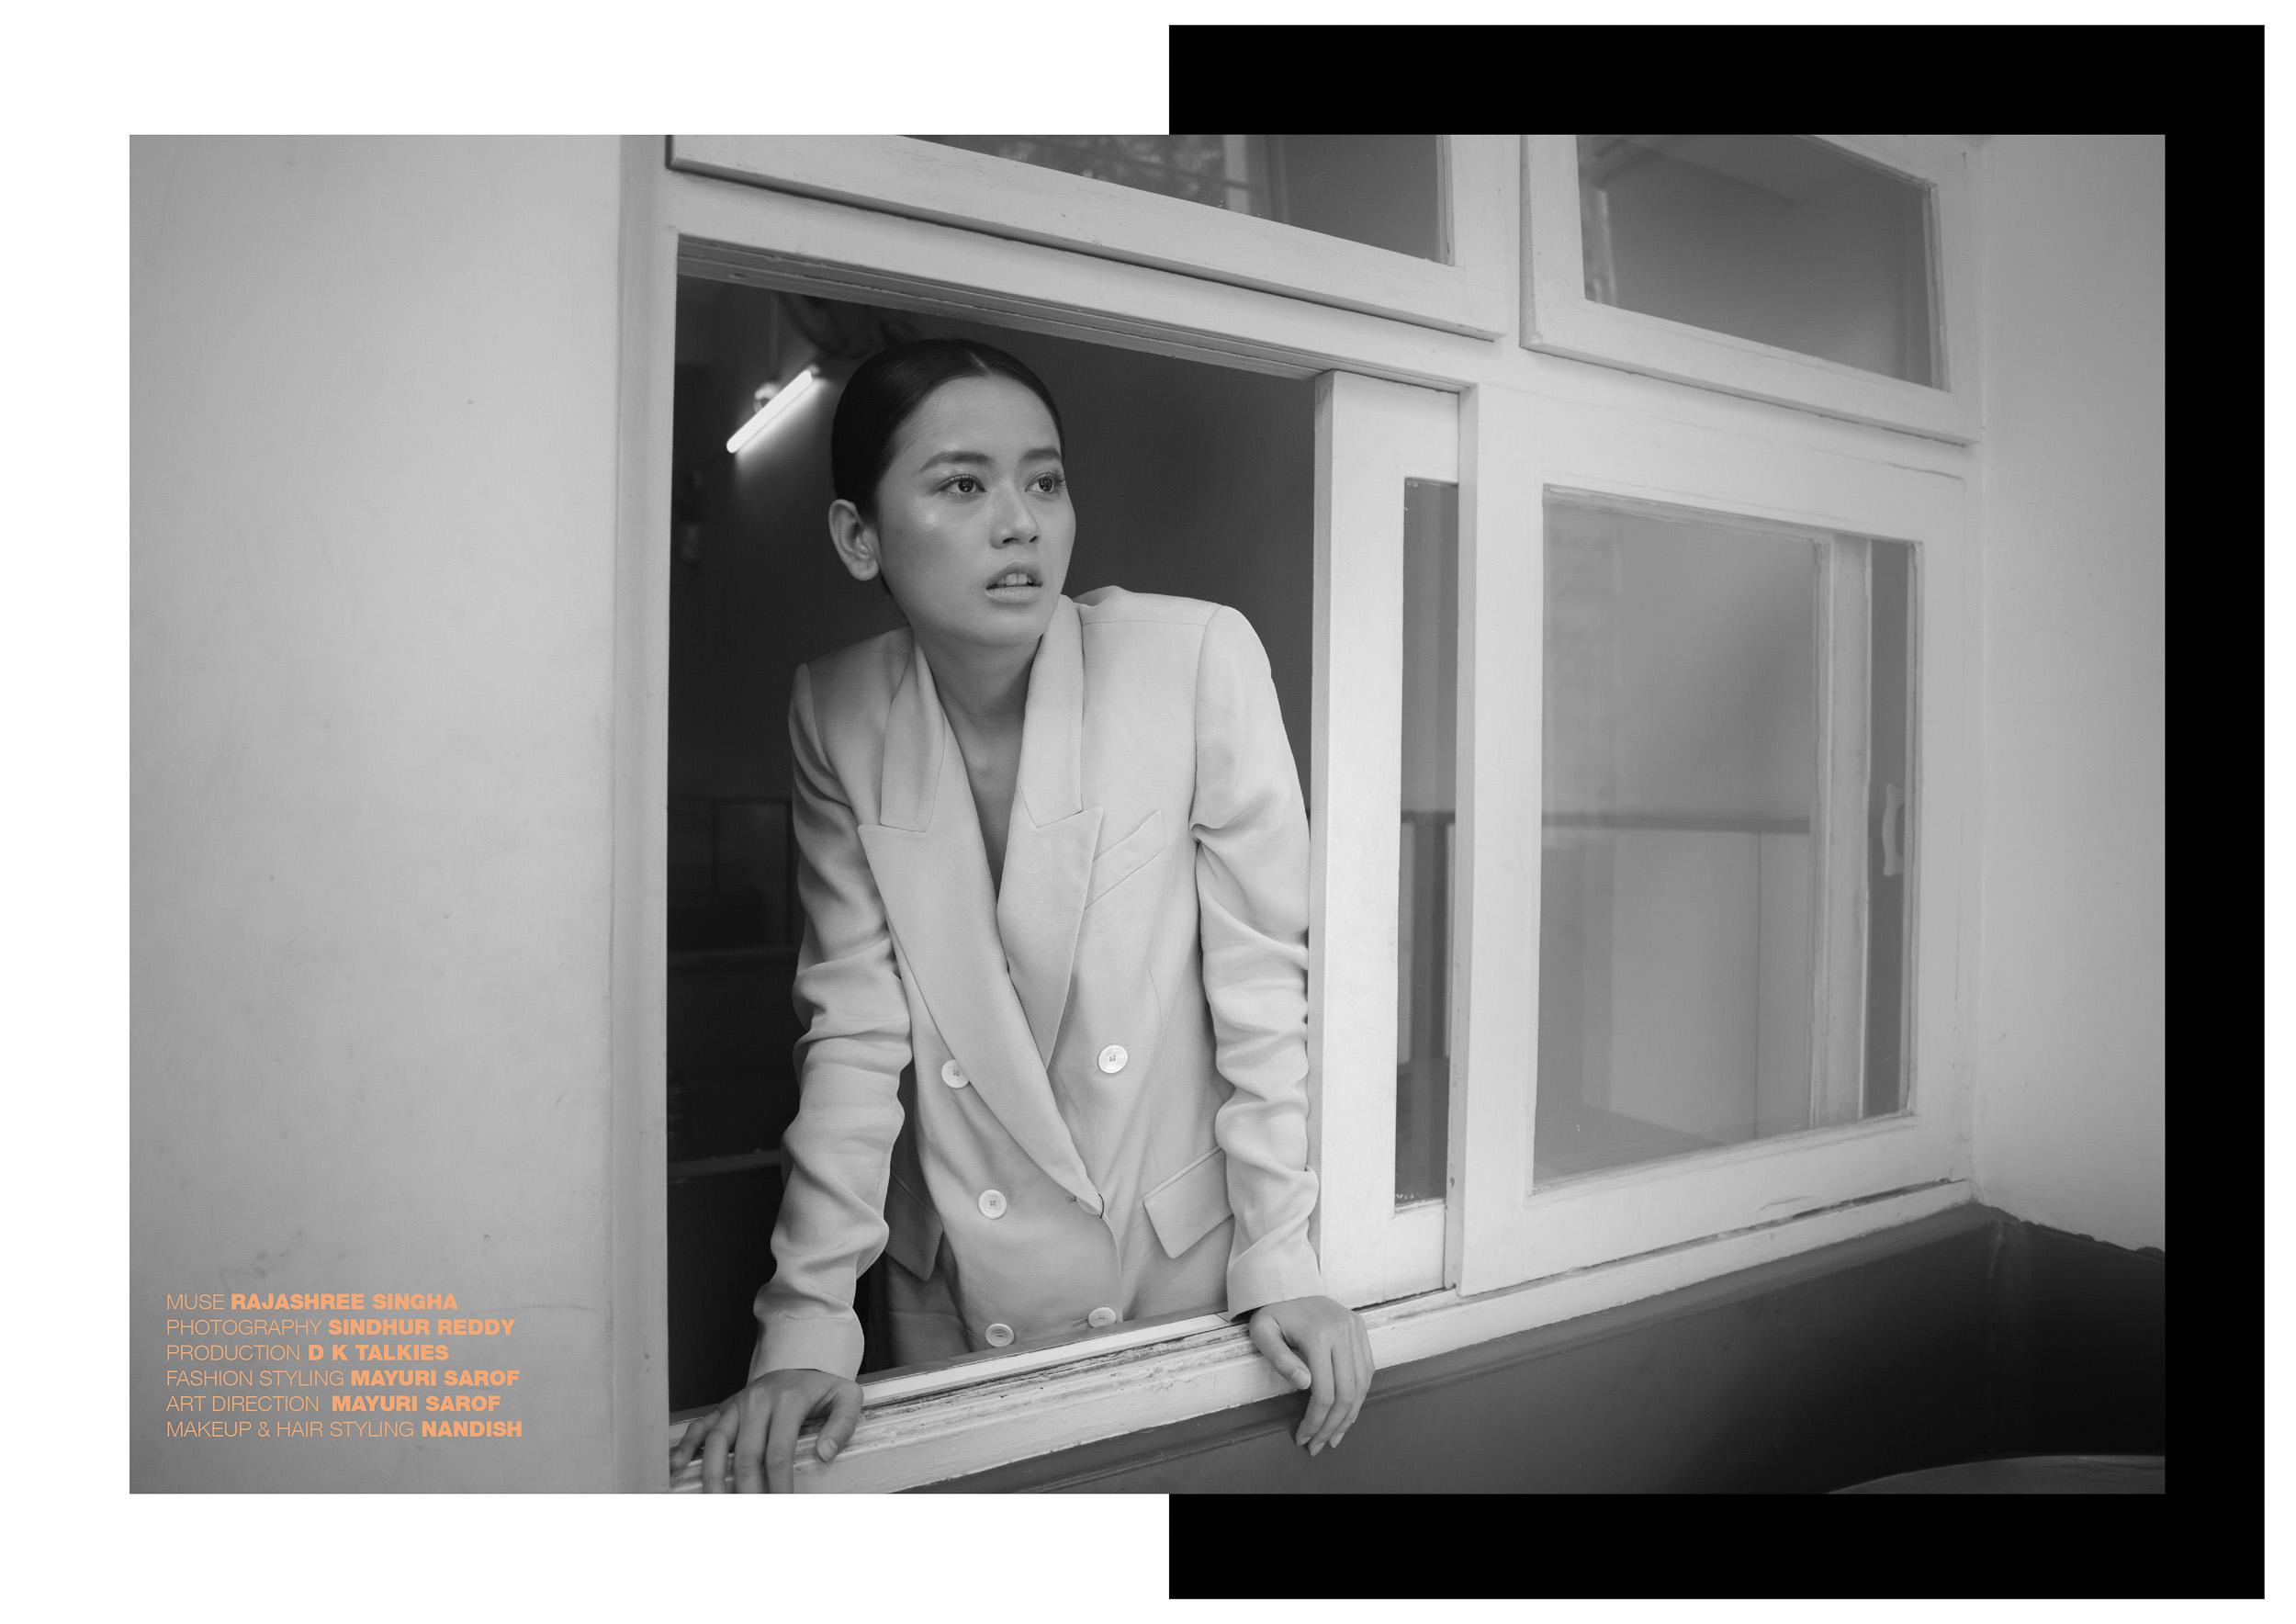 Sindhur_Photography_Fashion_StopTheExcuses-11.JPG